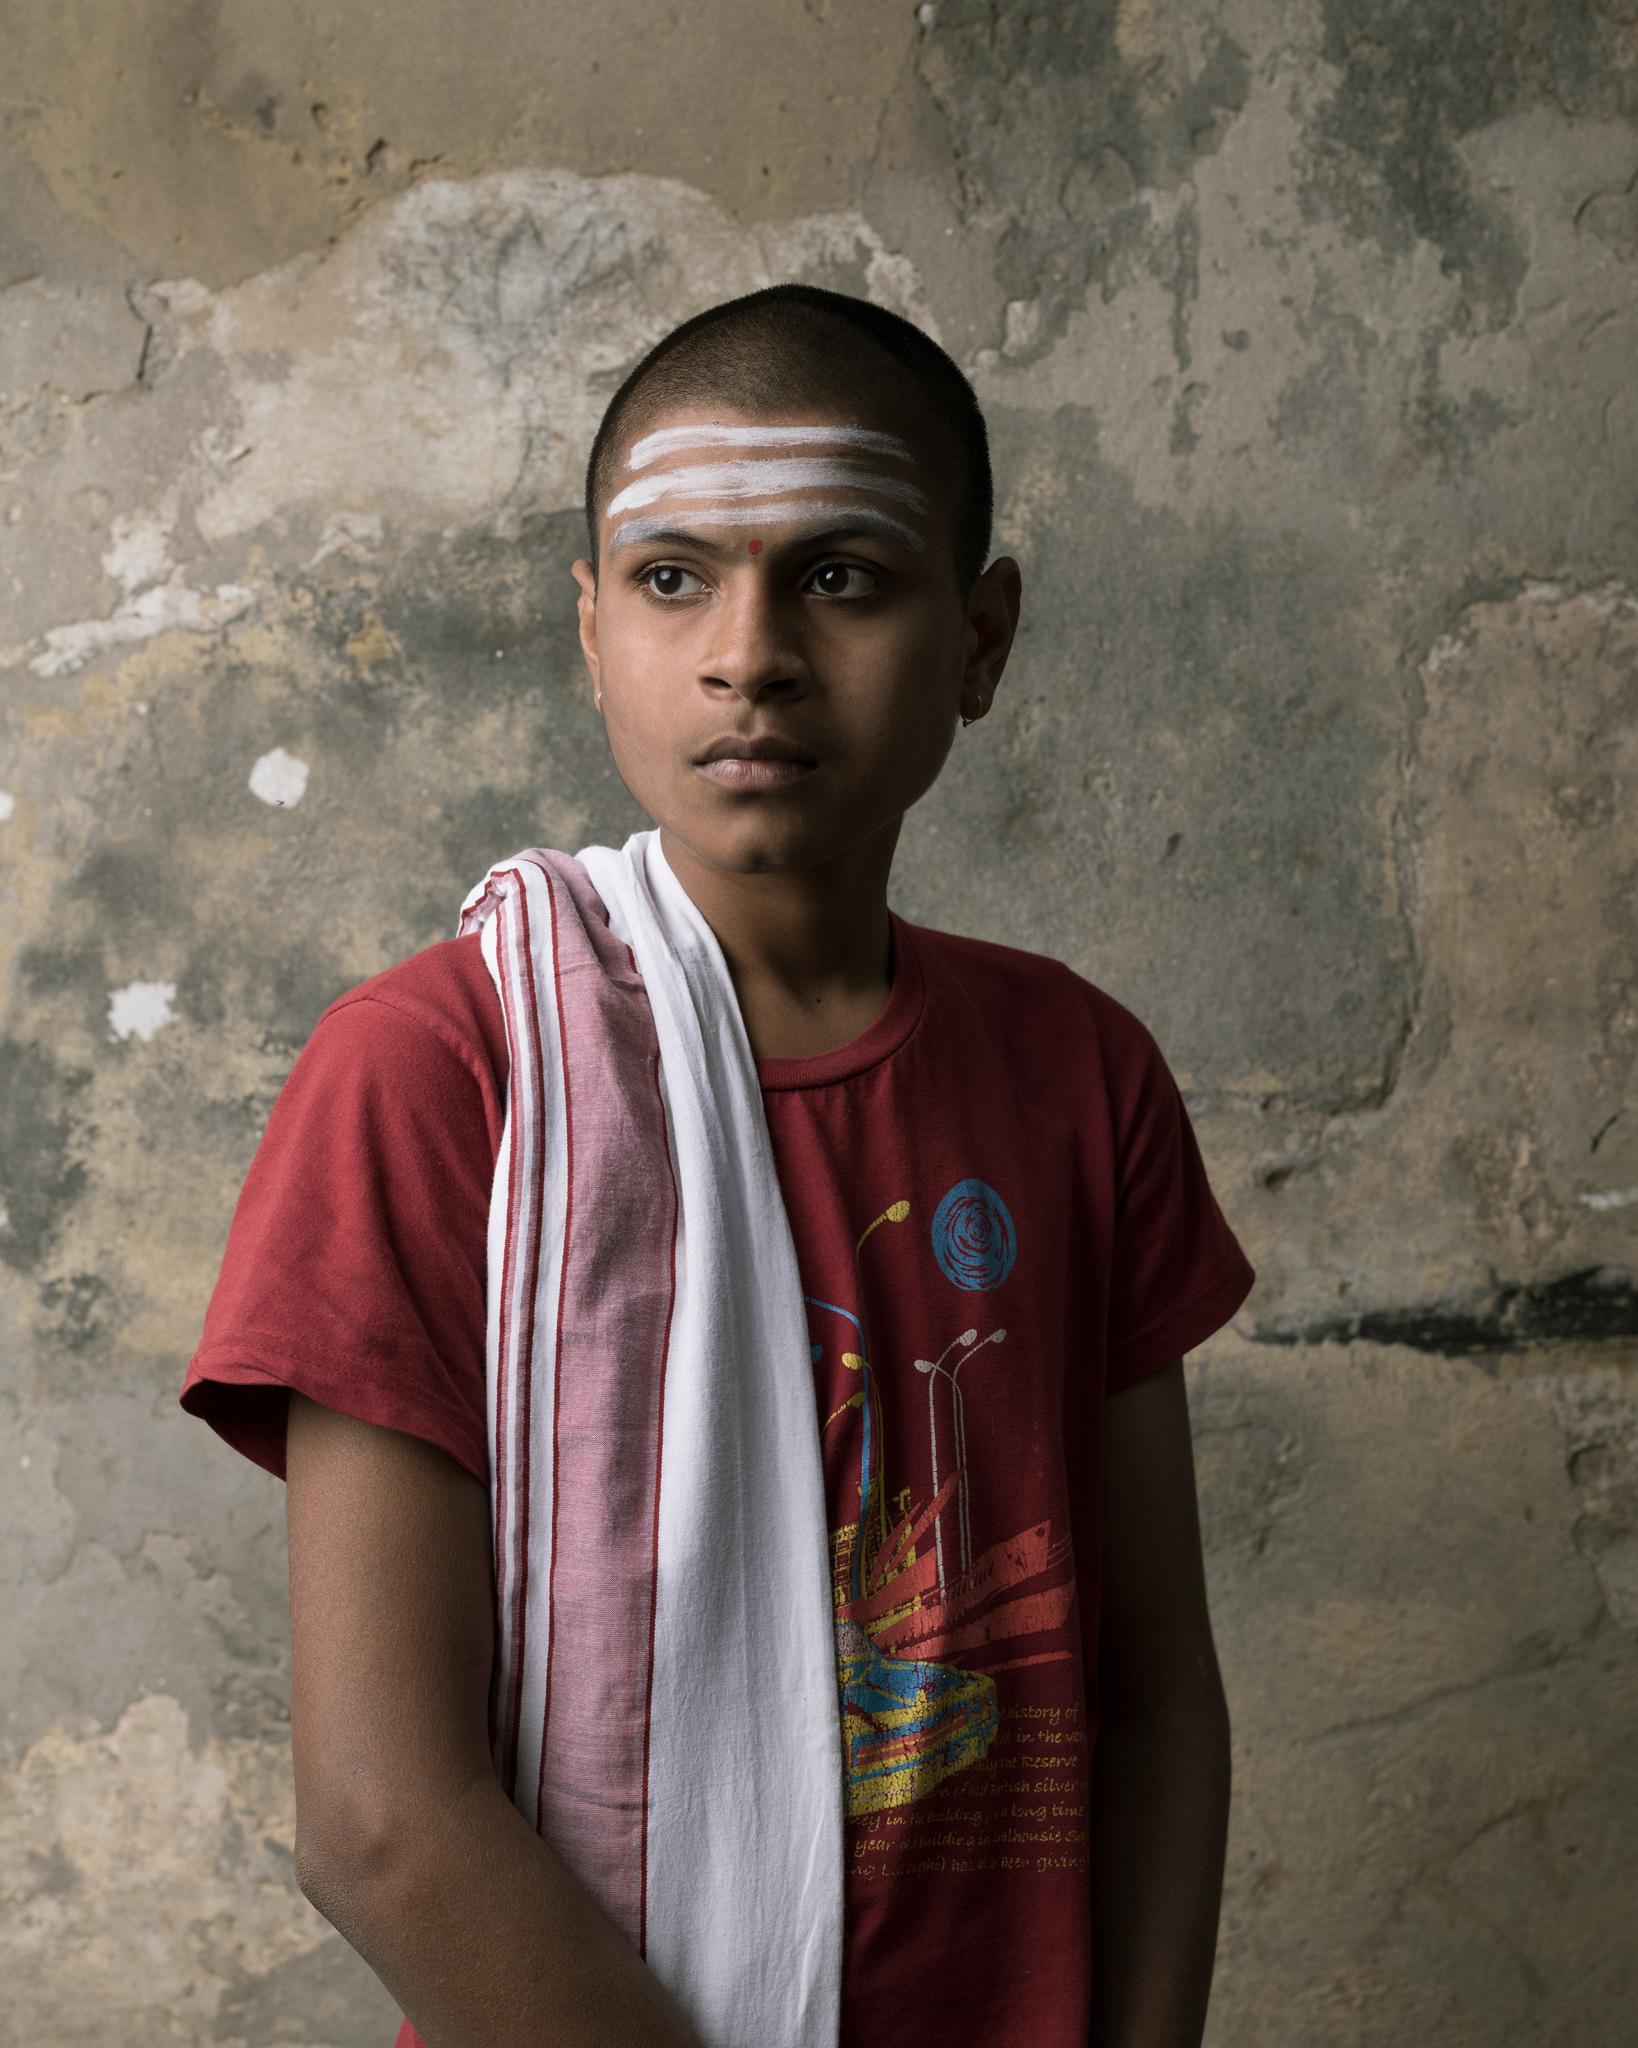 Varanasi_portrait_travel_photography_Manchester_Adventure_Photographer_Jan_Bella26.jpg